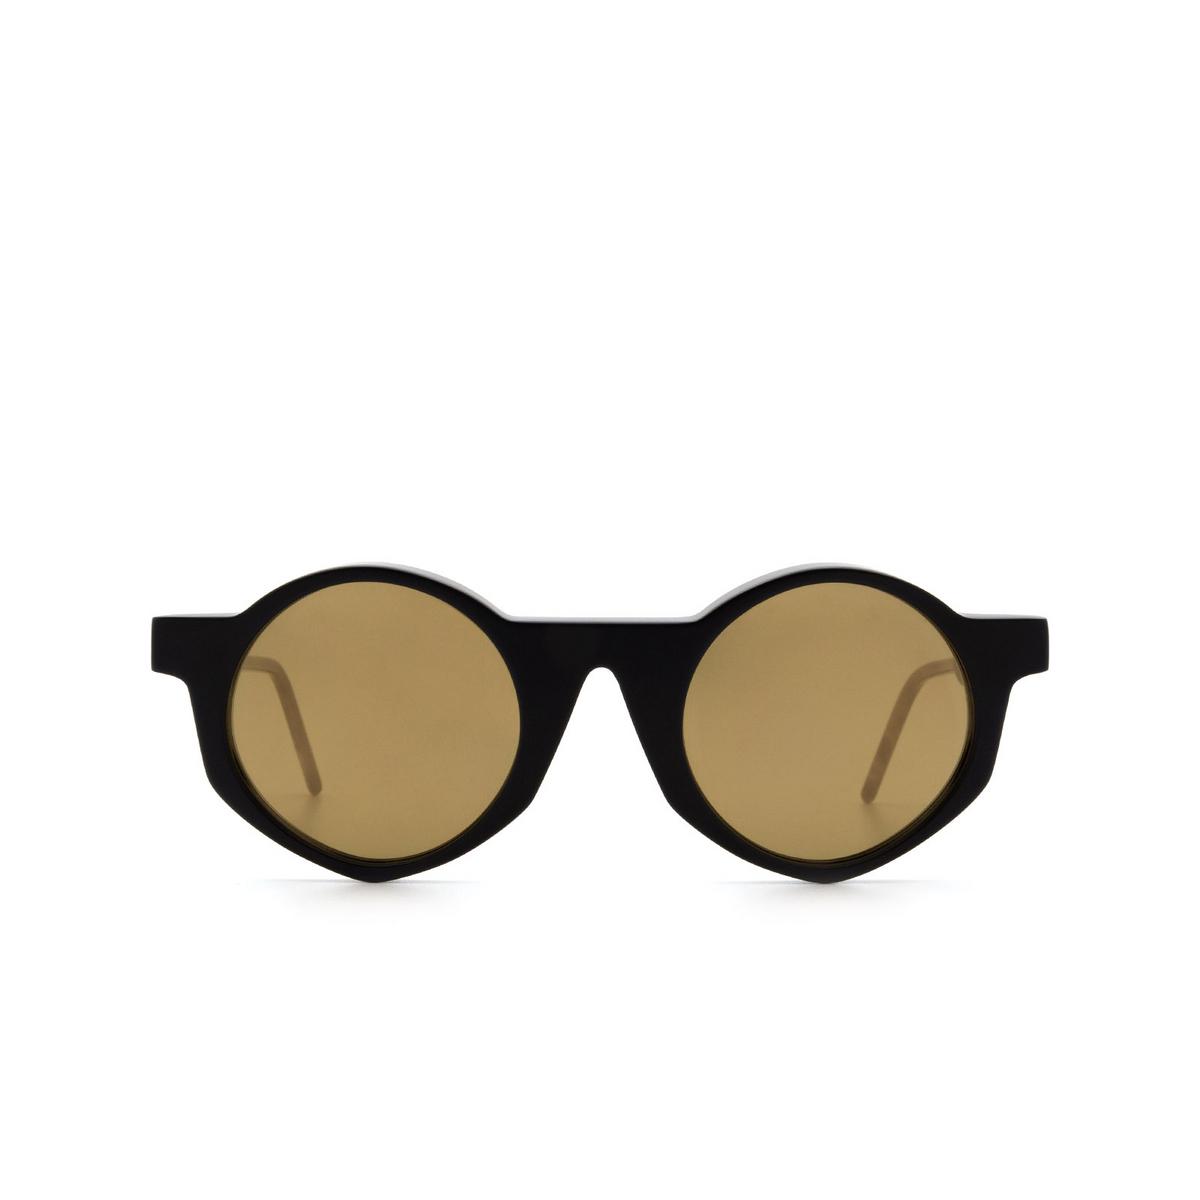 Soya® Round Sunglasses: Off color Matte Black Bkm-g - front view.